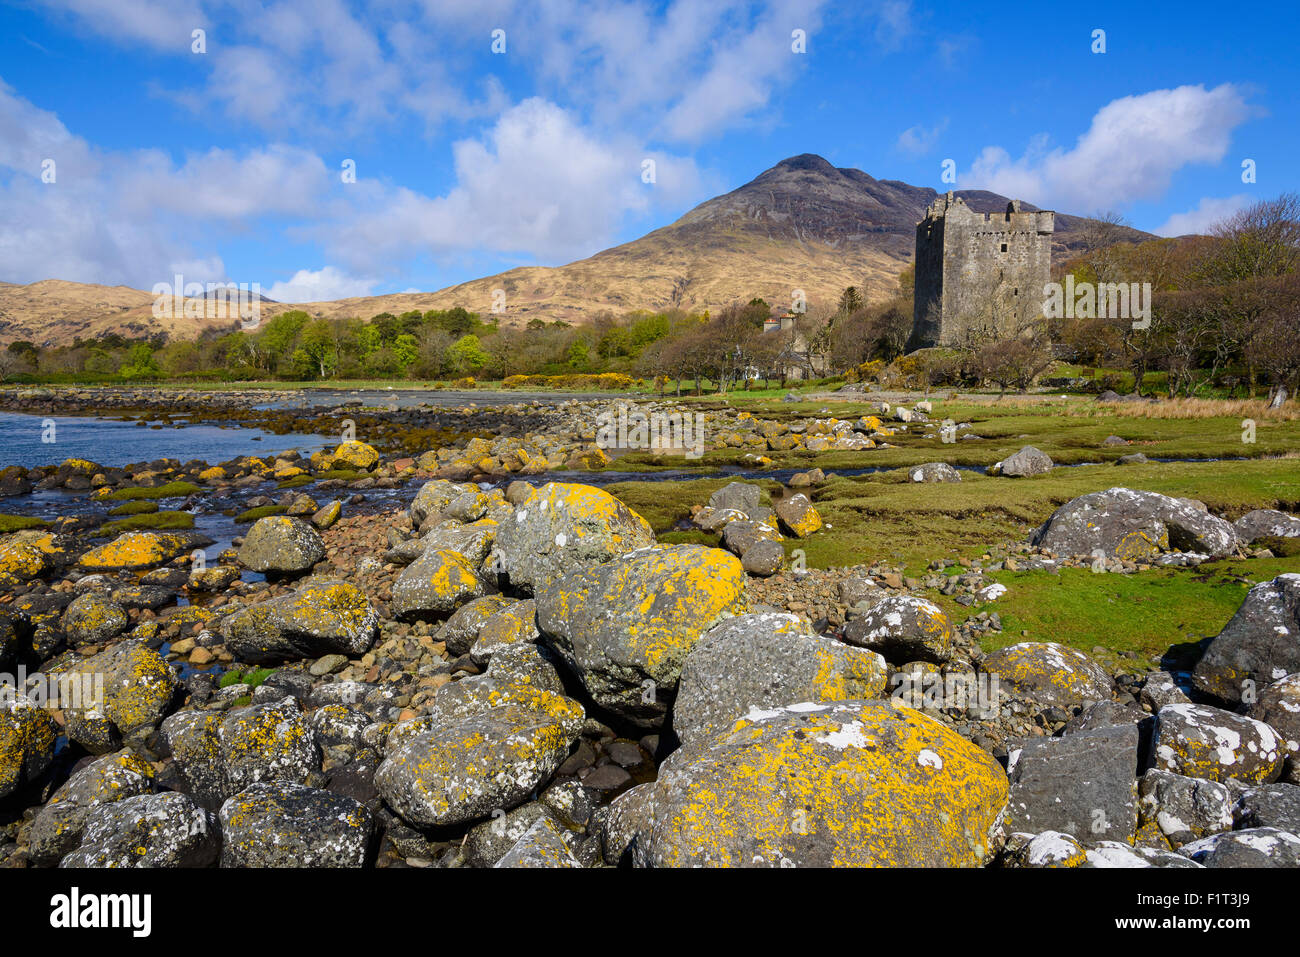 Moy Castle, Lochbuie, Isle of Mull, Inner Hebrides, Argyll and Bute, Scotland, United Kingdom, Europe - Stock Image